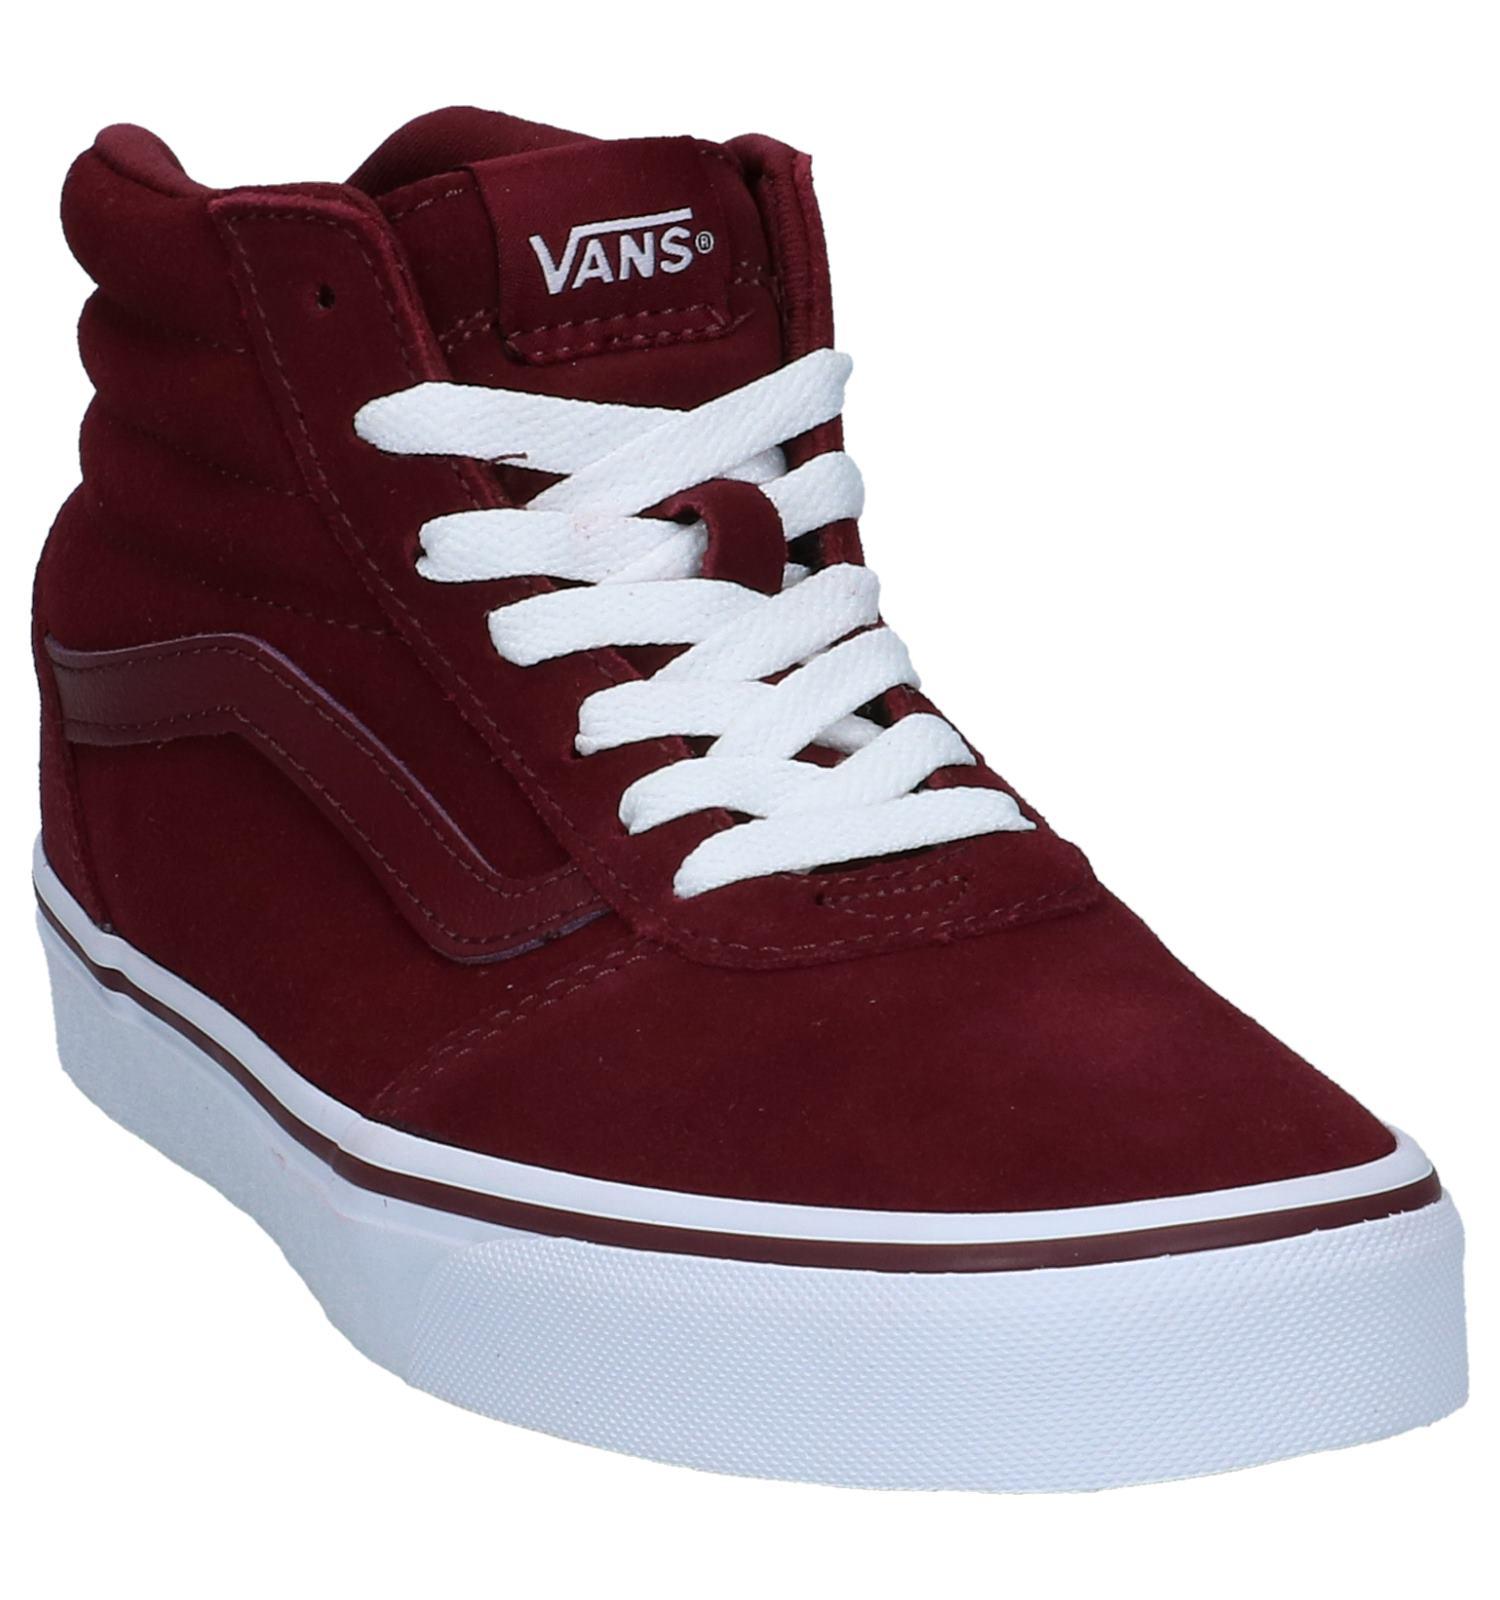 Hoge Ward Schoenen Skate Vans Hi Bordeaux Nn8wvm0